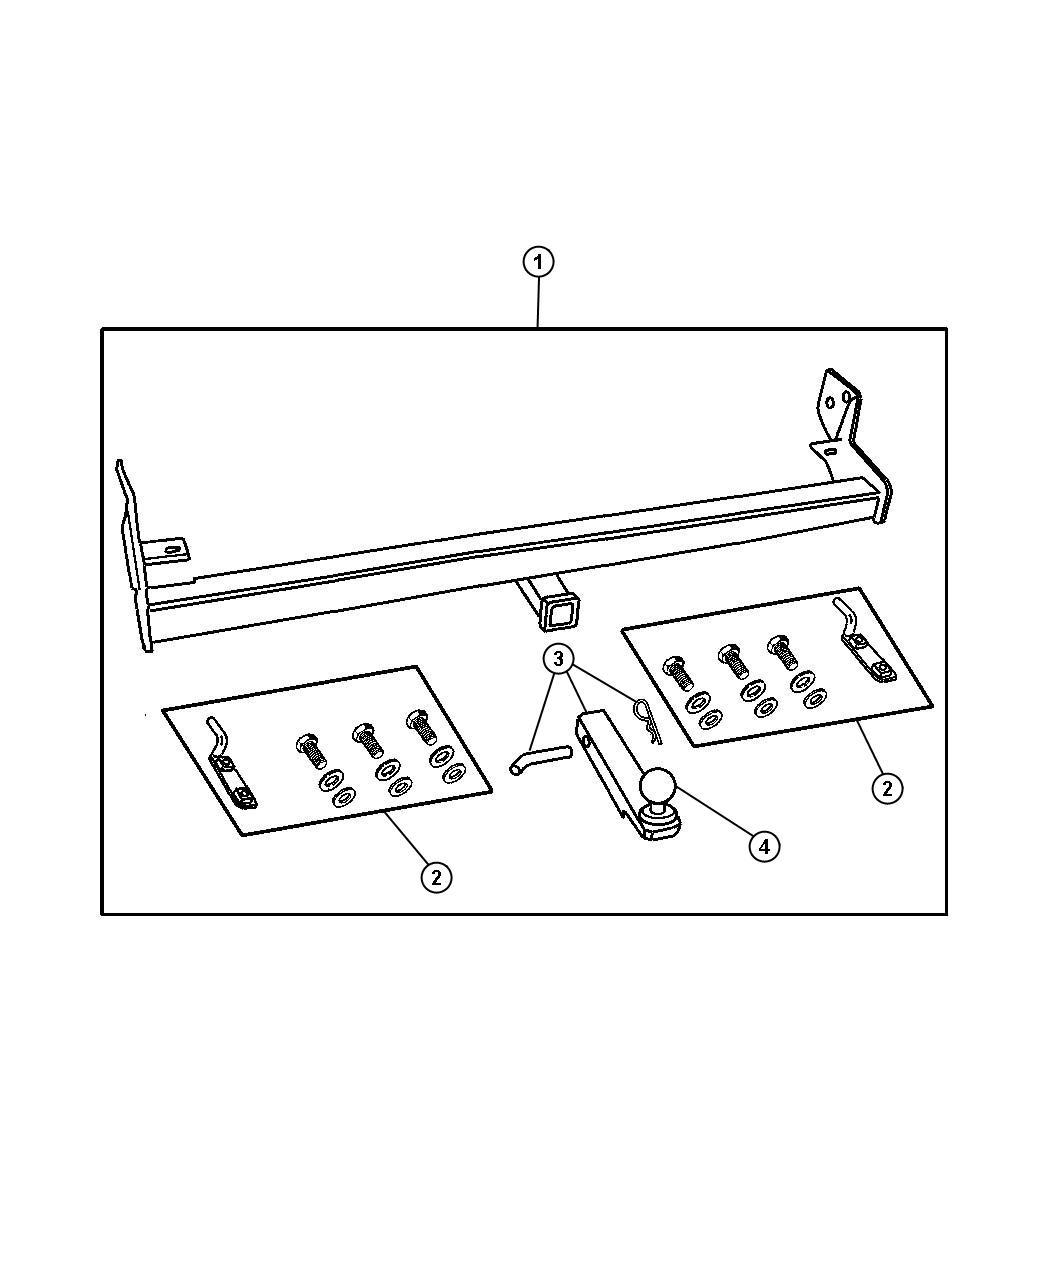 Dodge Grand Caravan Adapter Kit Drawbar Attachment